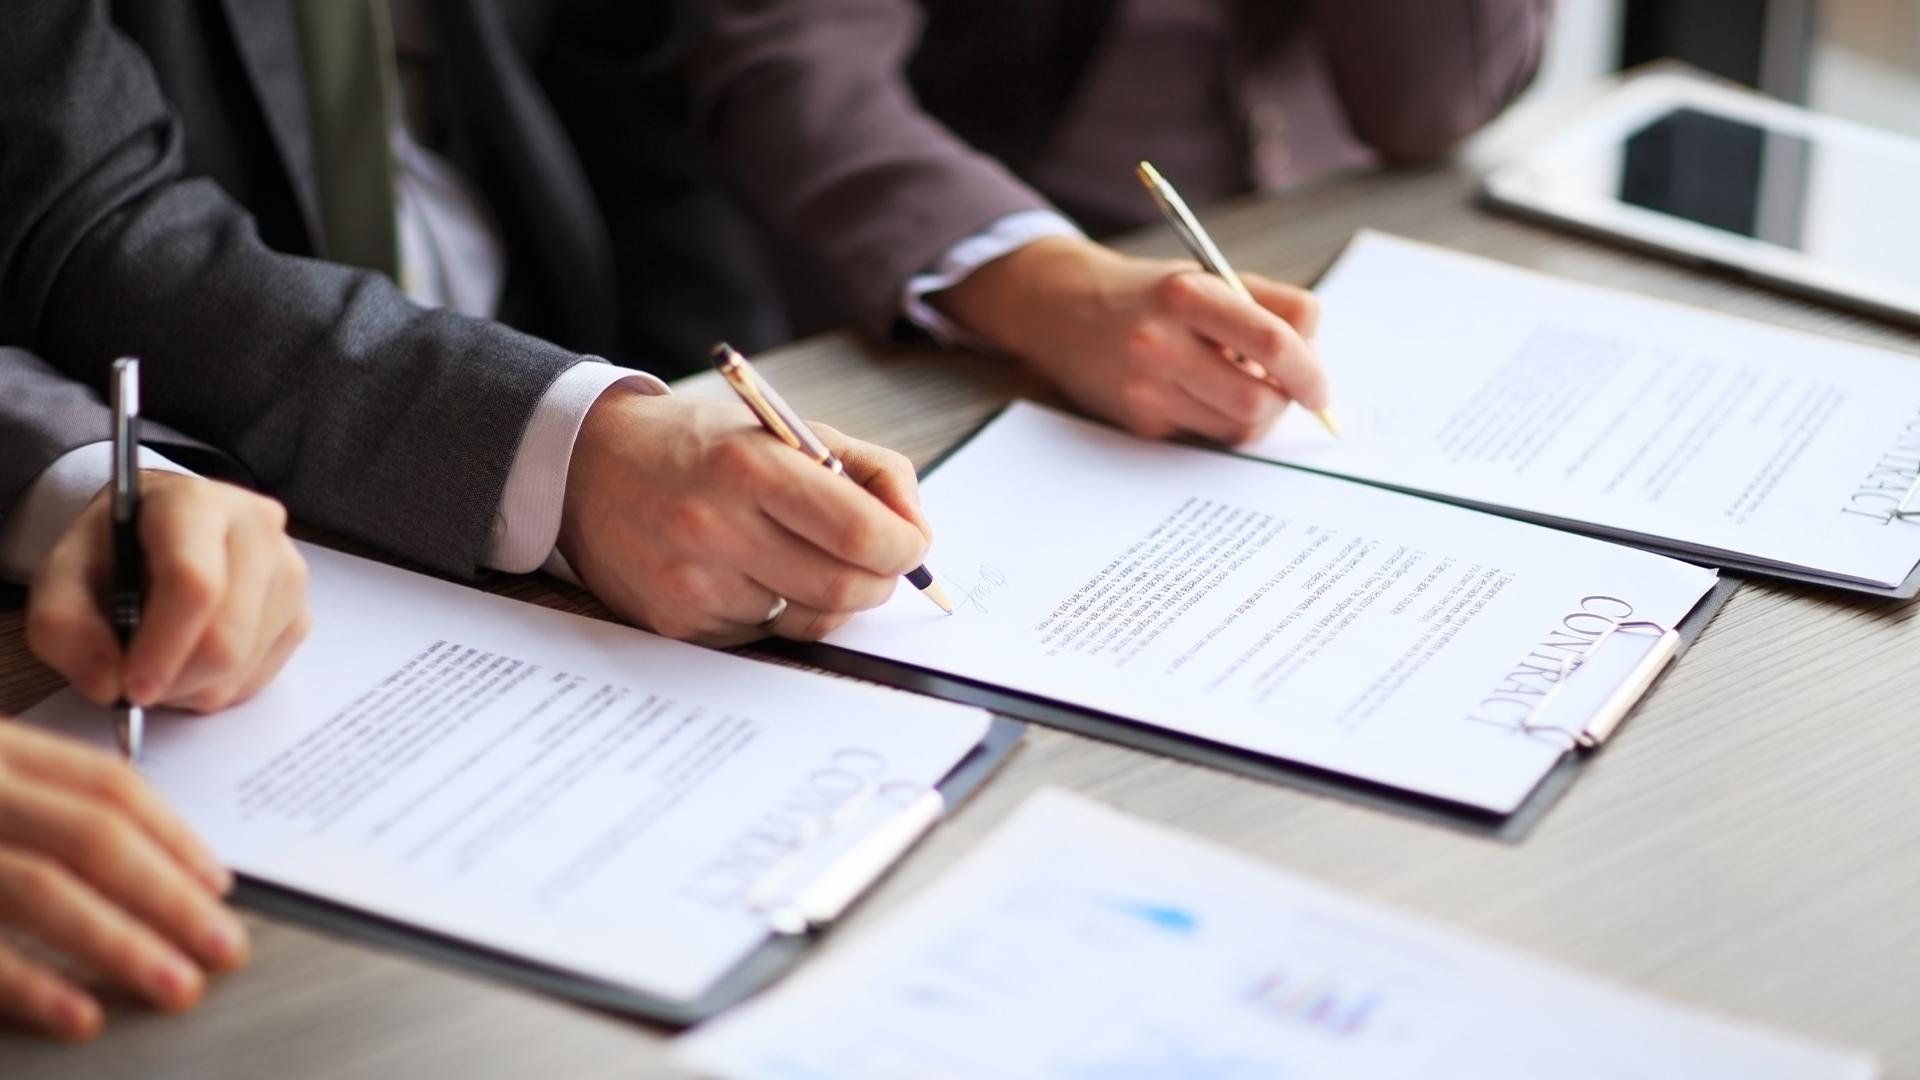 Contact-panel-memorandum-sign-agreement